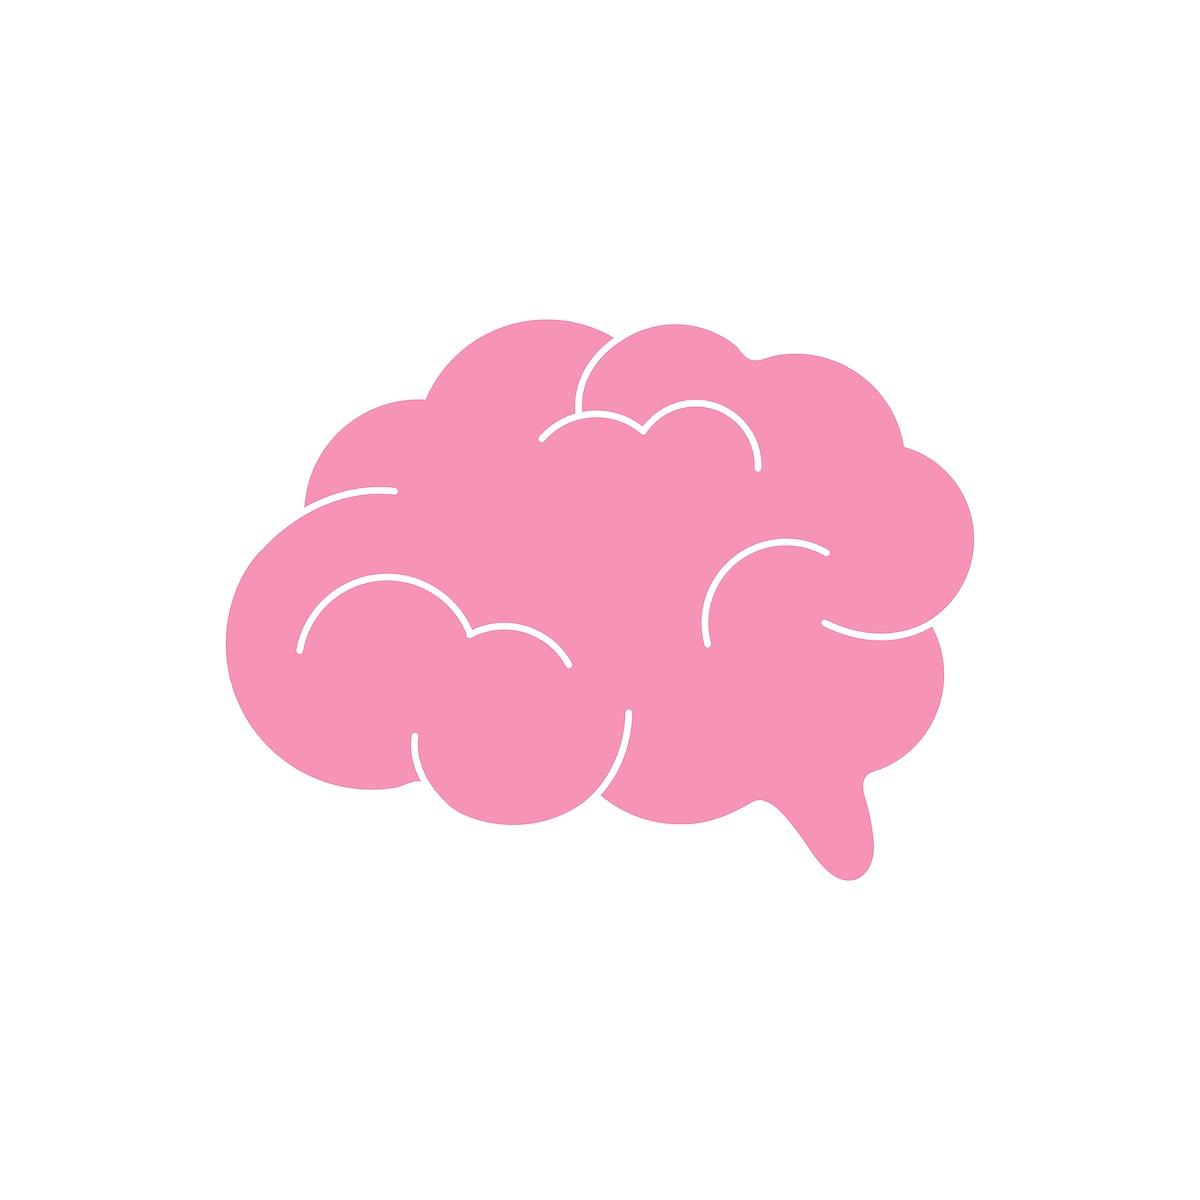 Pink human brain graphic illustration